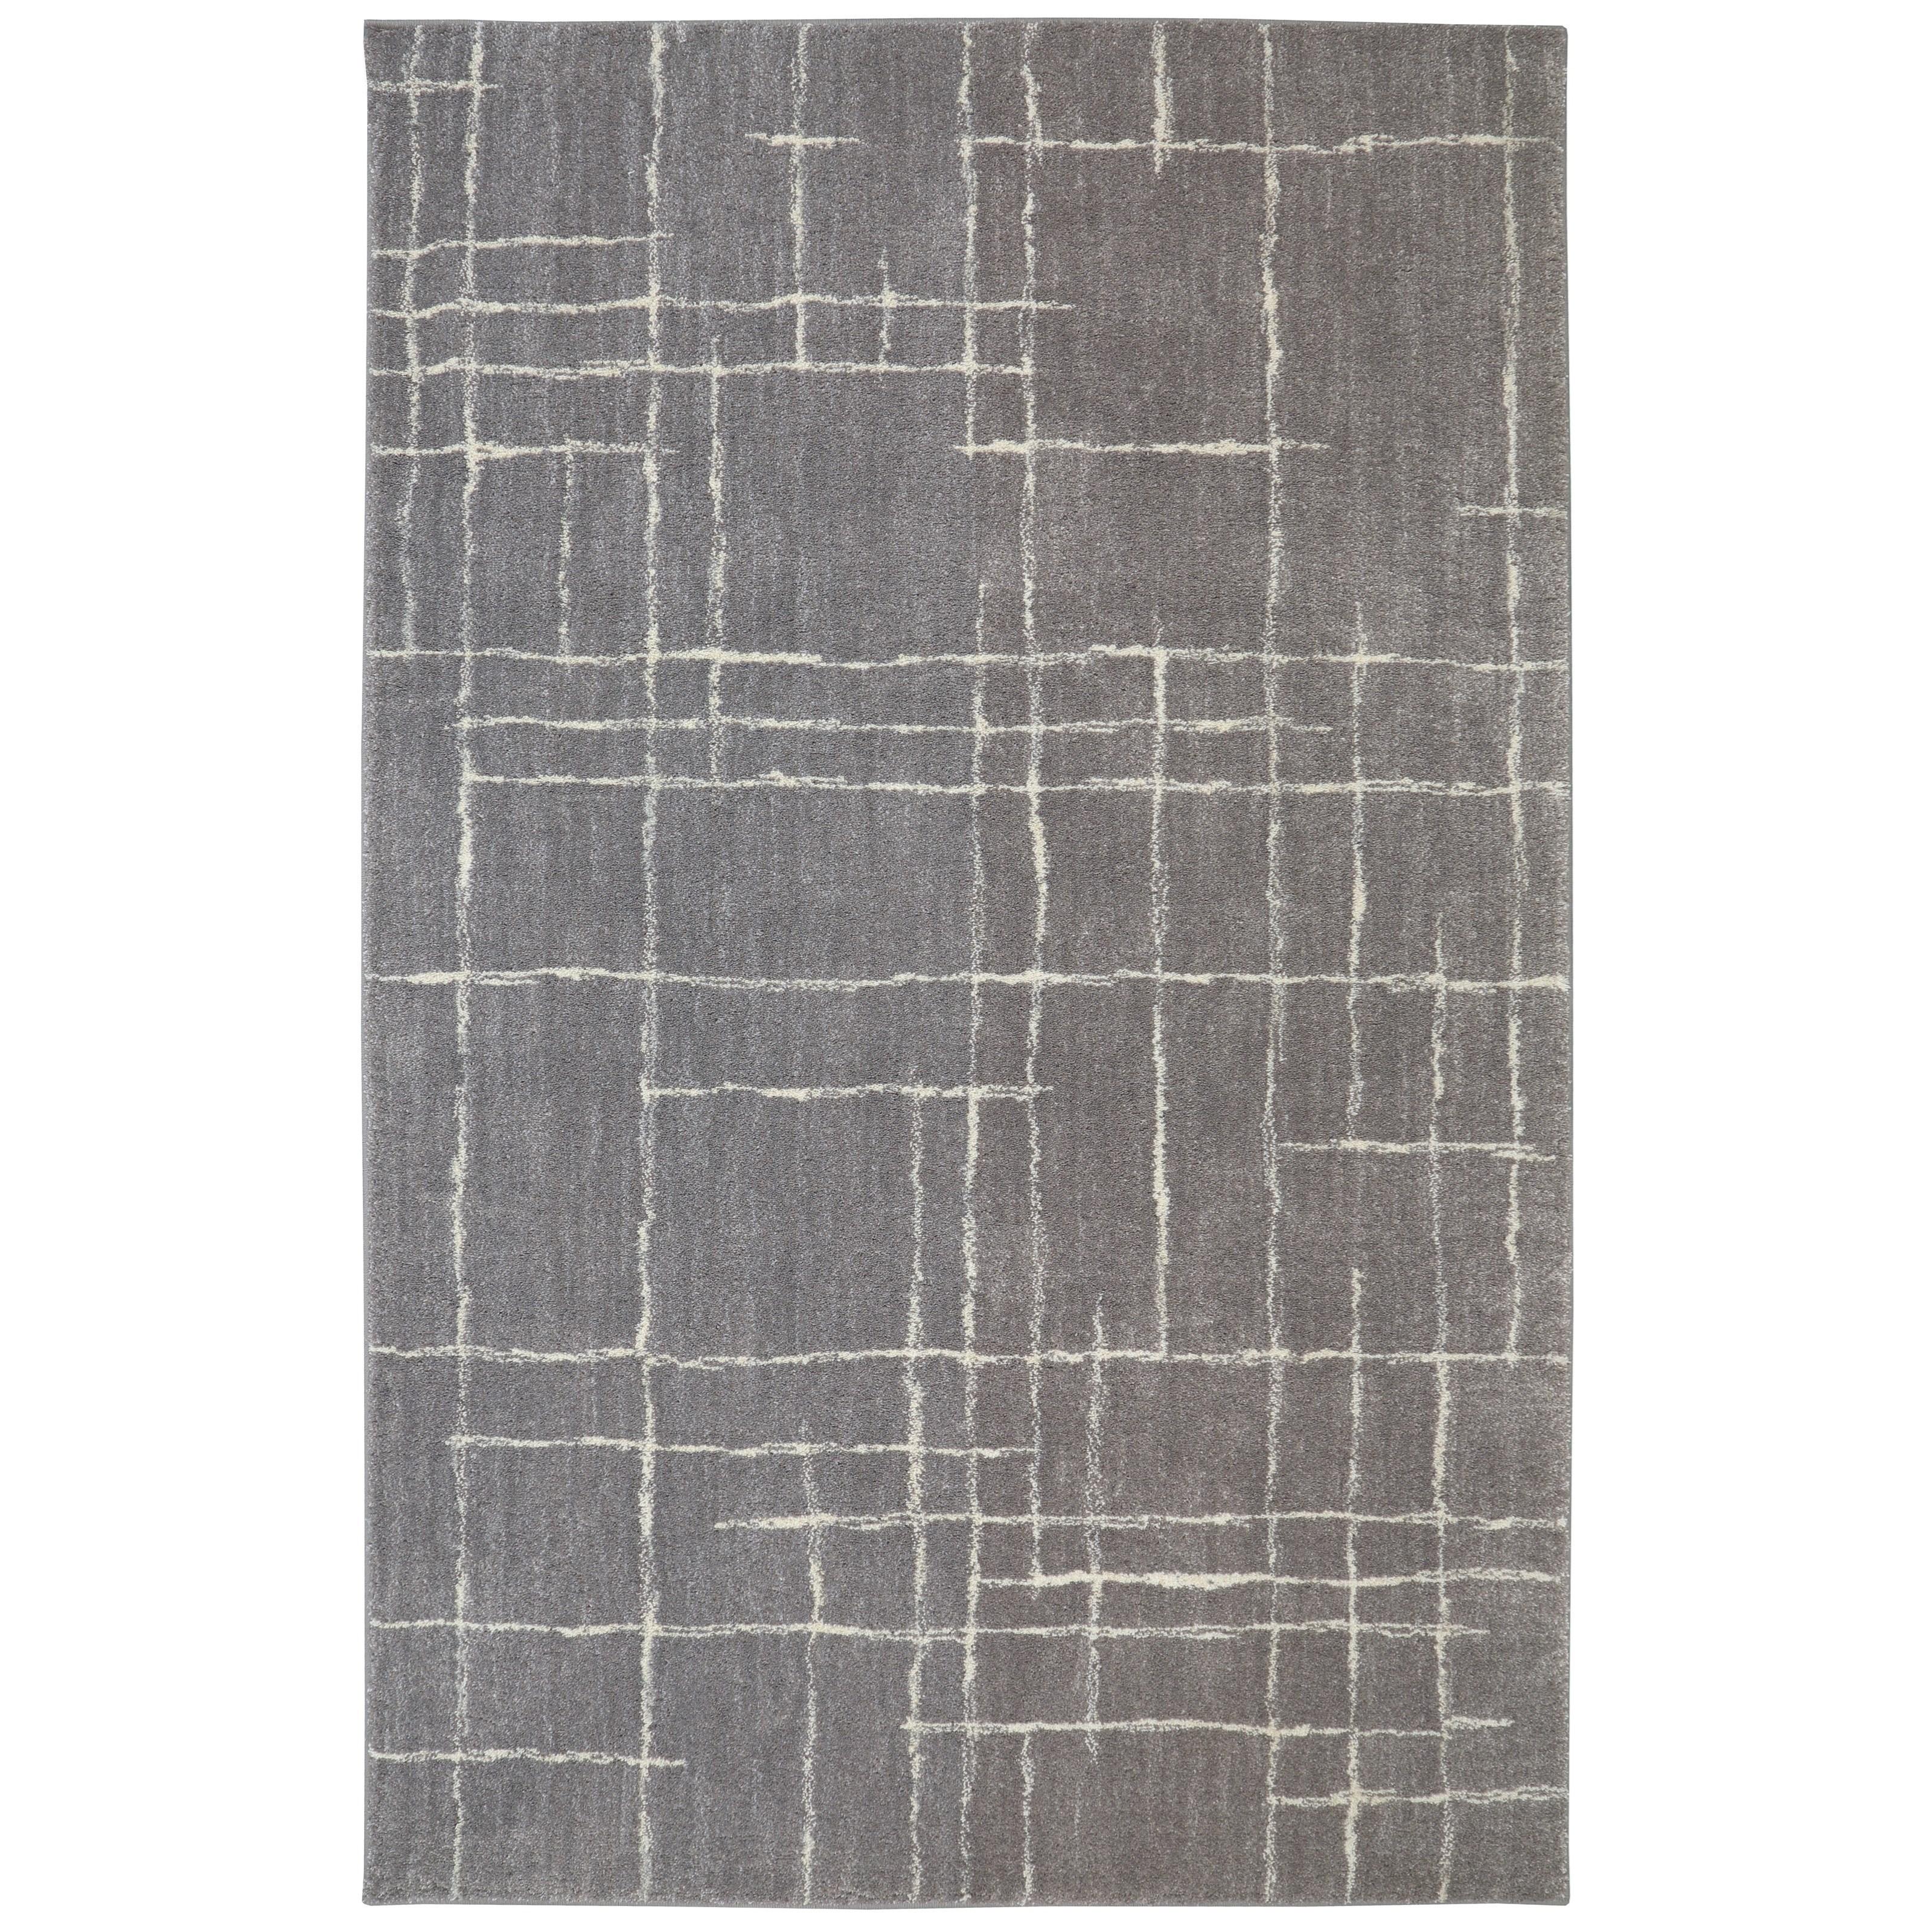 Berkshire 10'x14' Chatham Grey Area Rug by American Rug Craftsmen at Alison Craig Home Furnishings